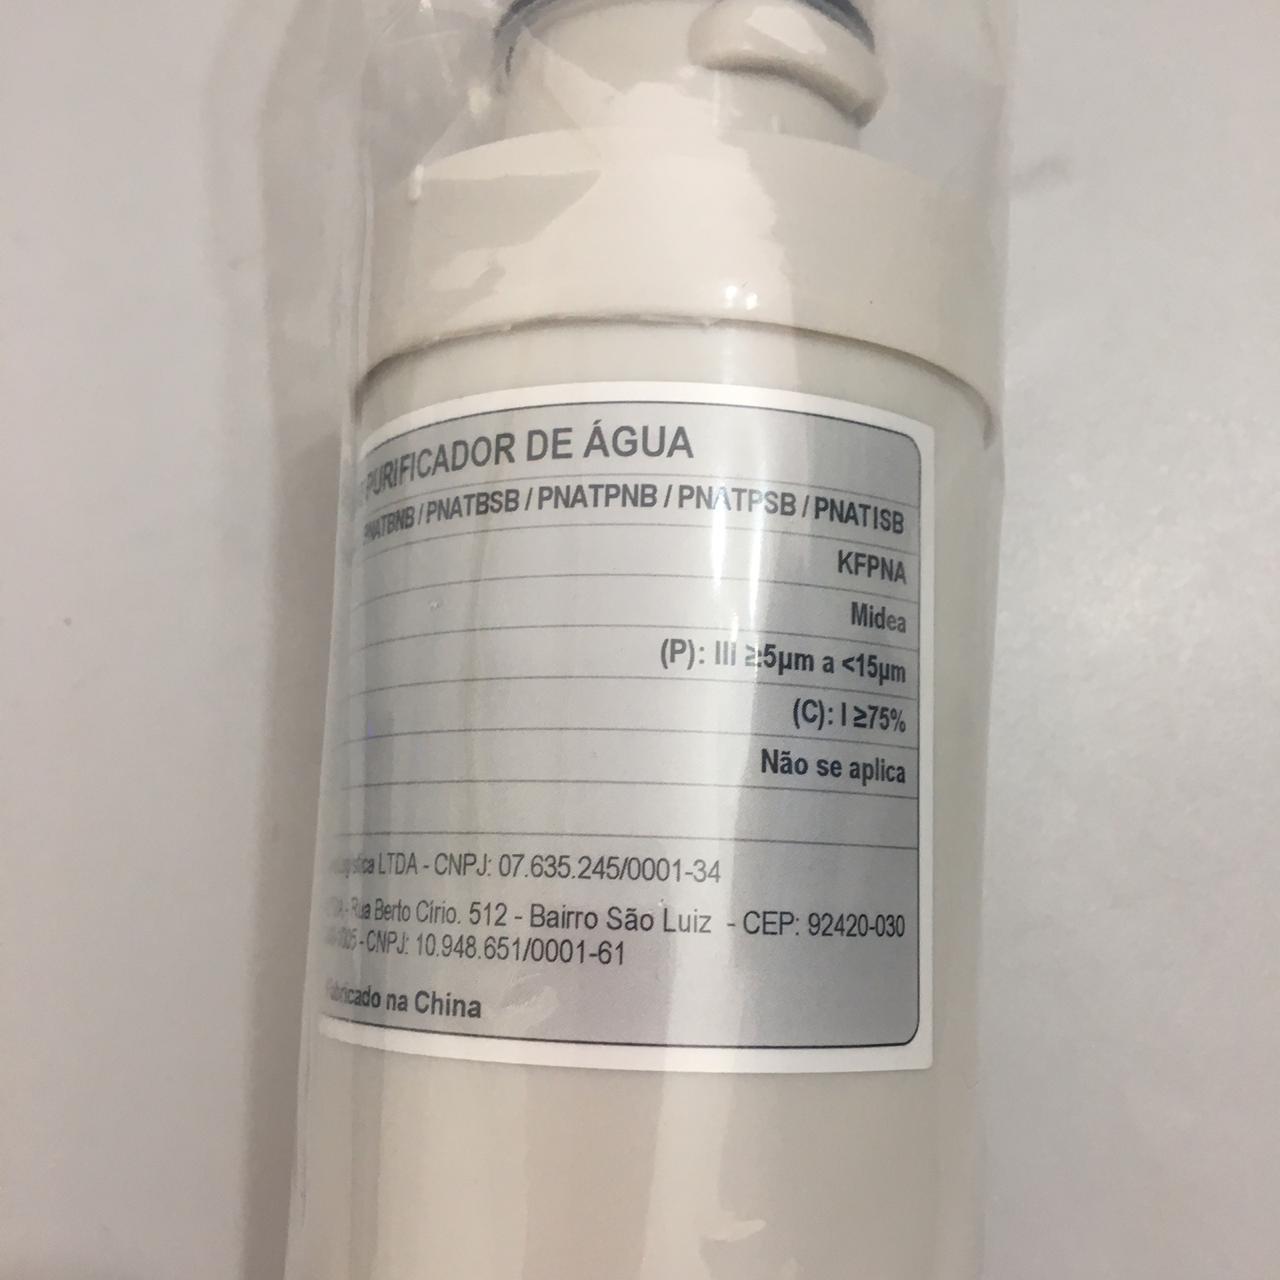 Refil Filtro KFPNA Purificador de Água Midea Original